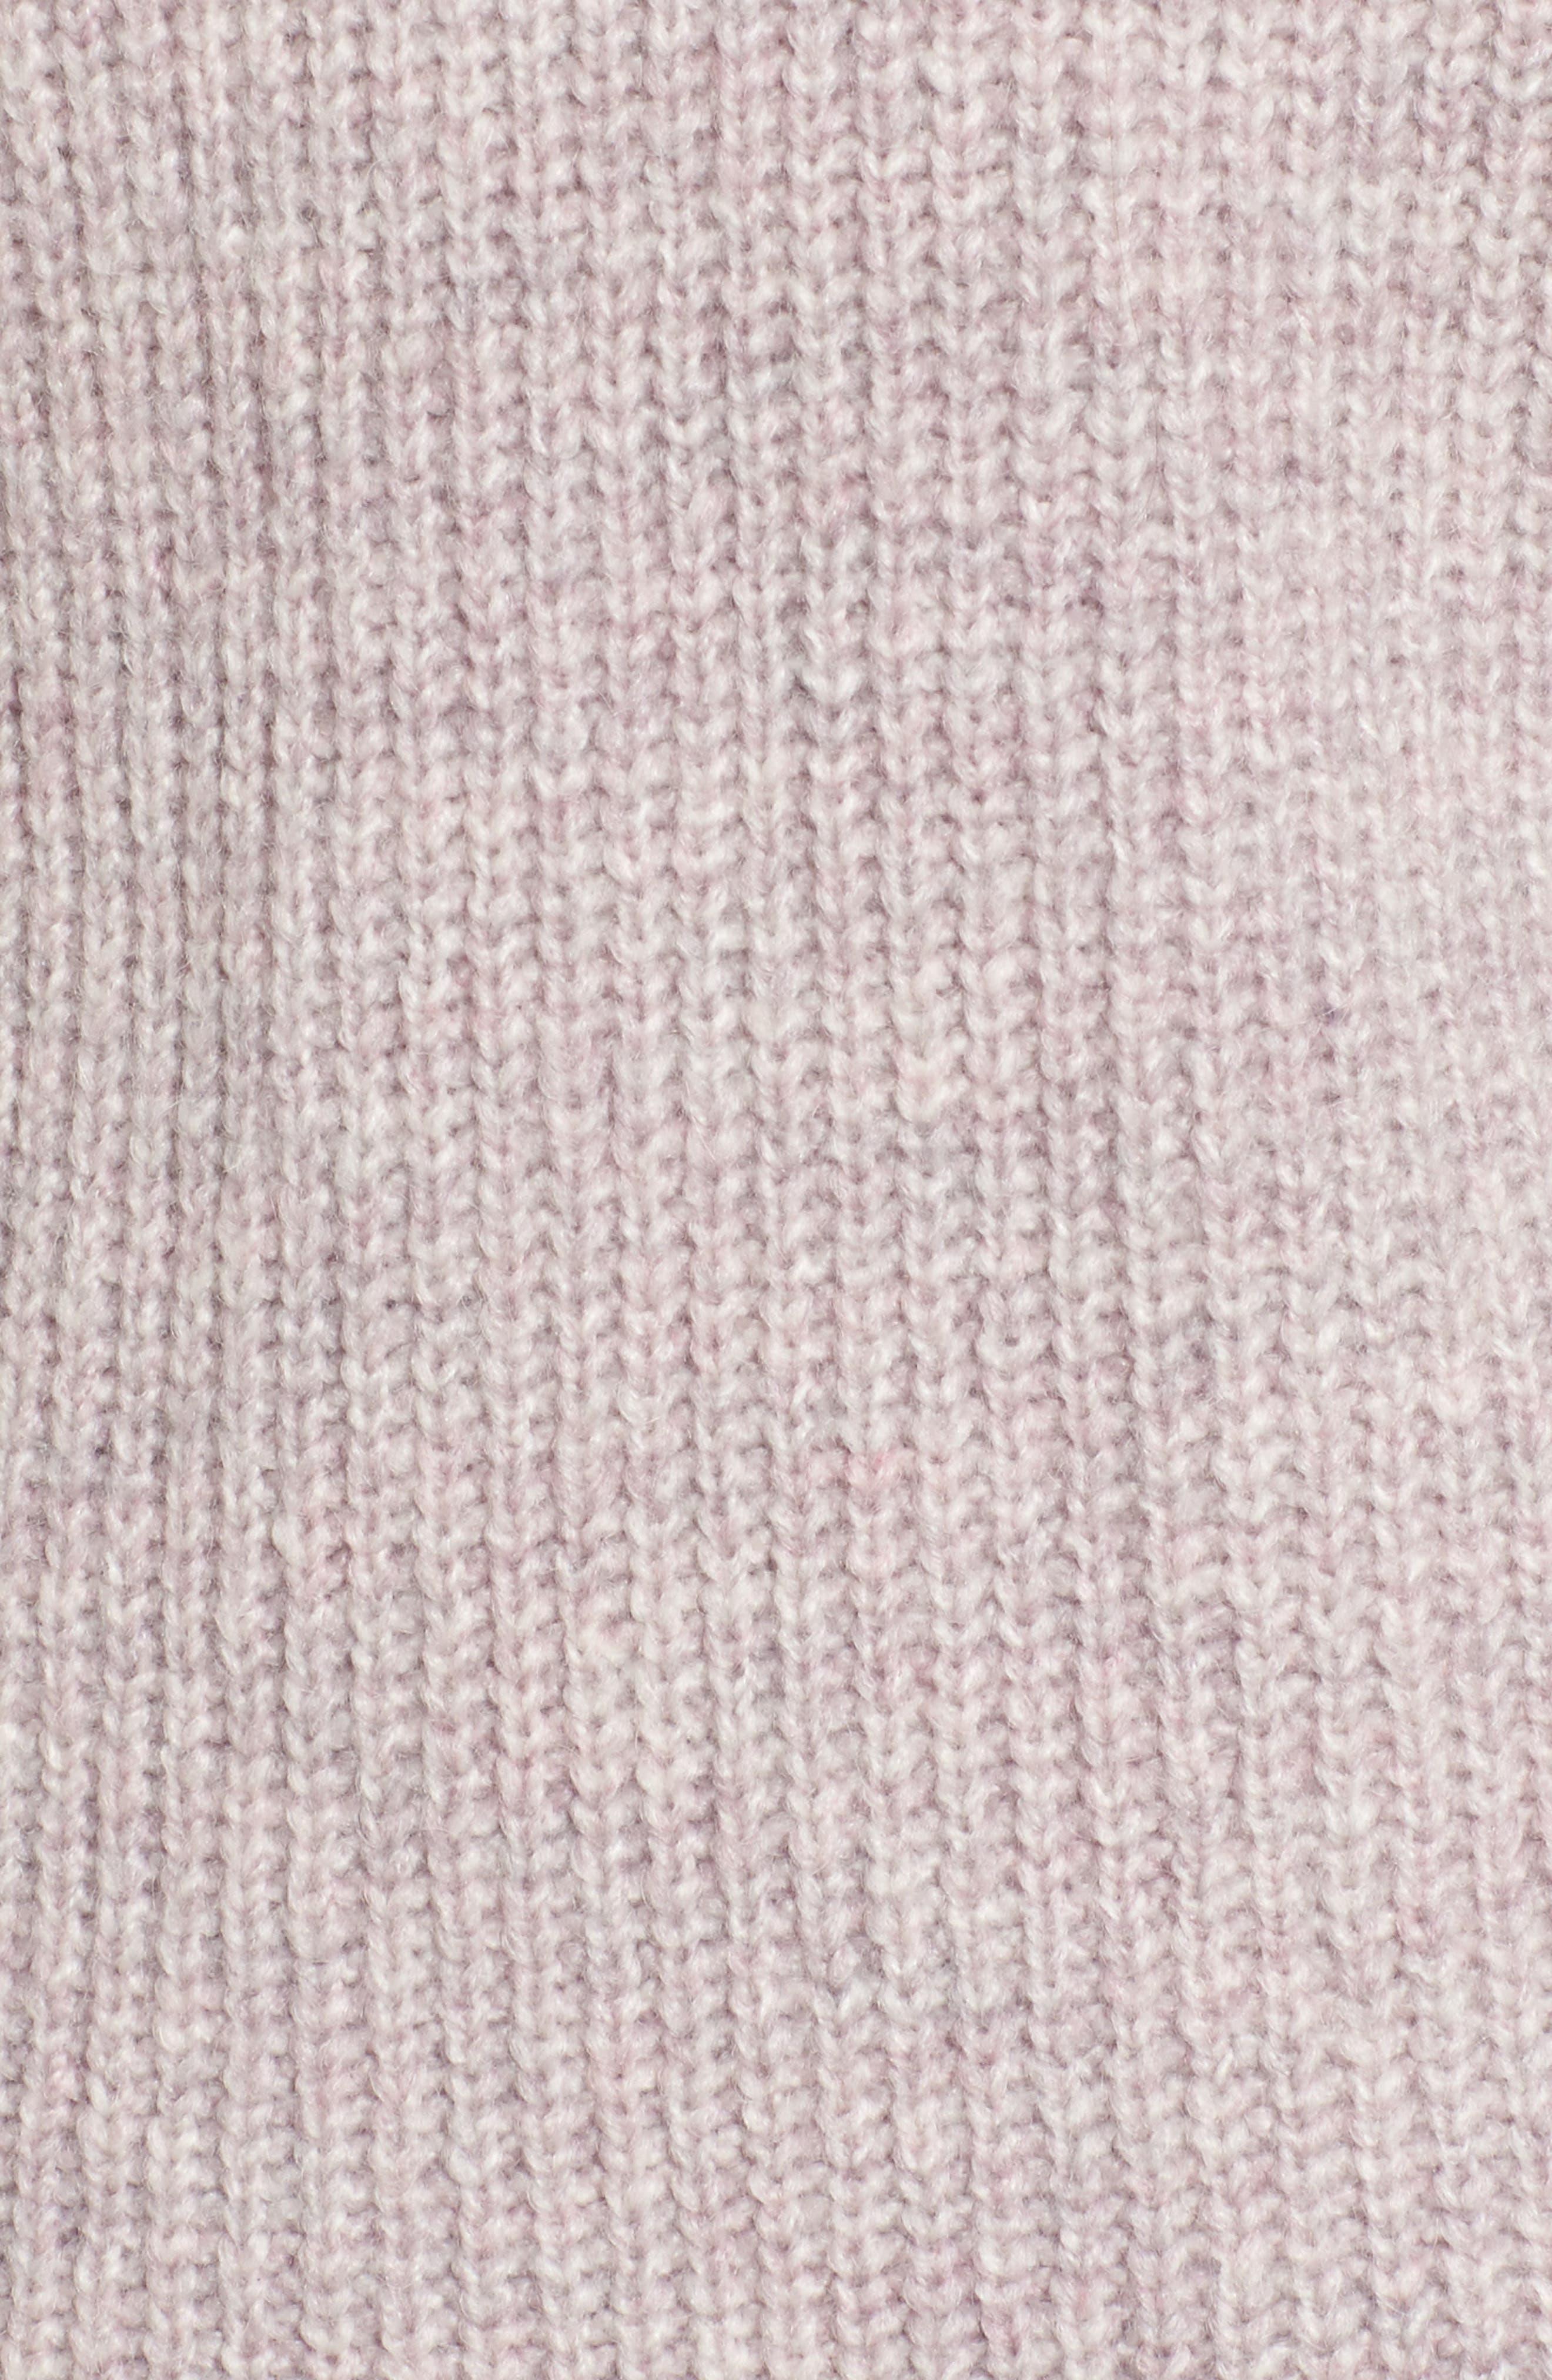 Berea Fringe Cardigan Sweater,                             Alternate thumbnail 5, color,                             684